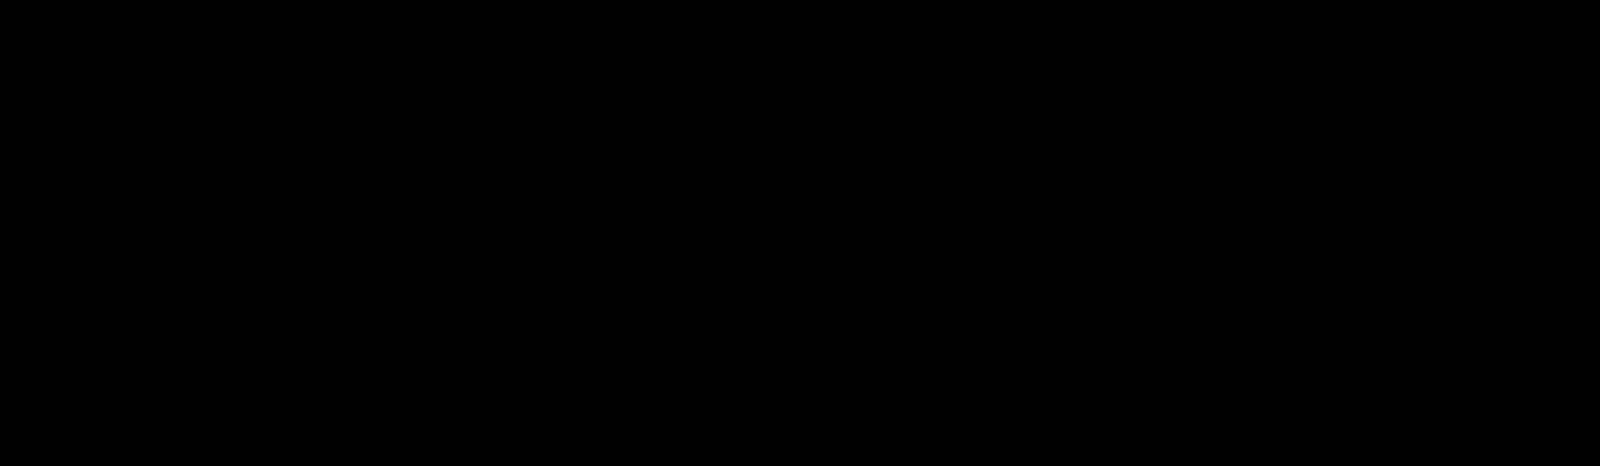 Stabl logo